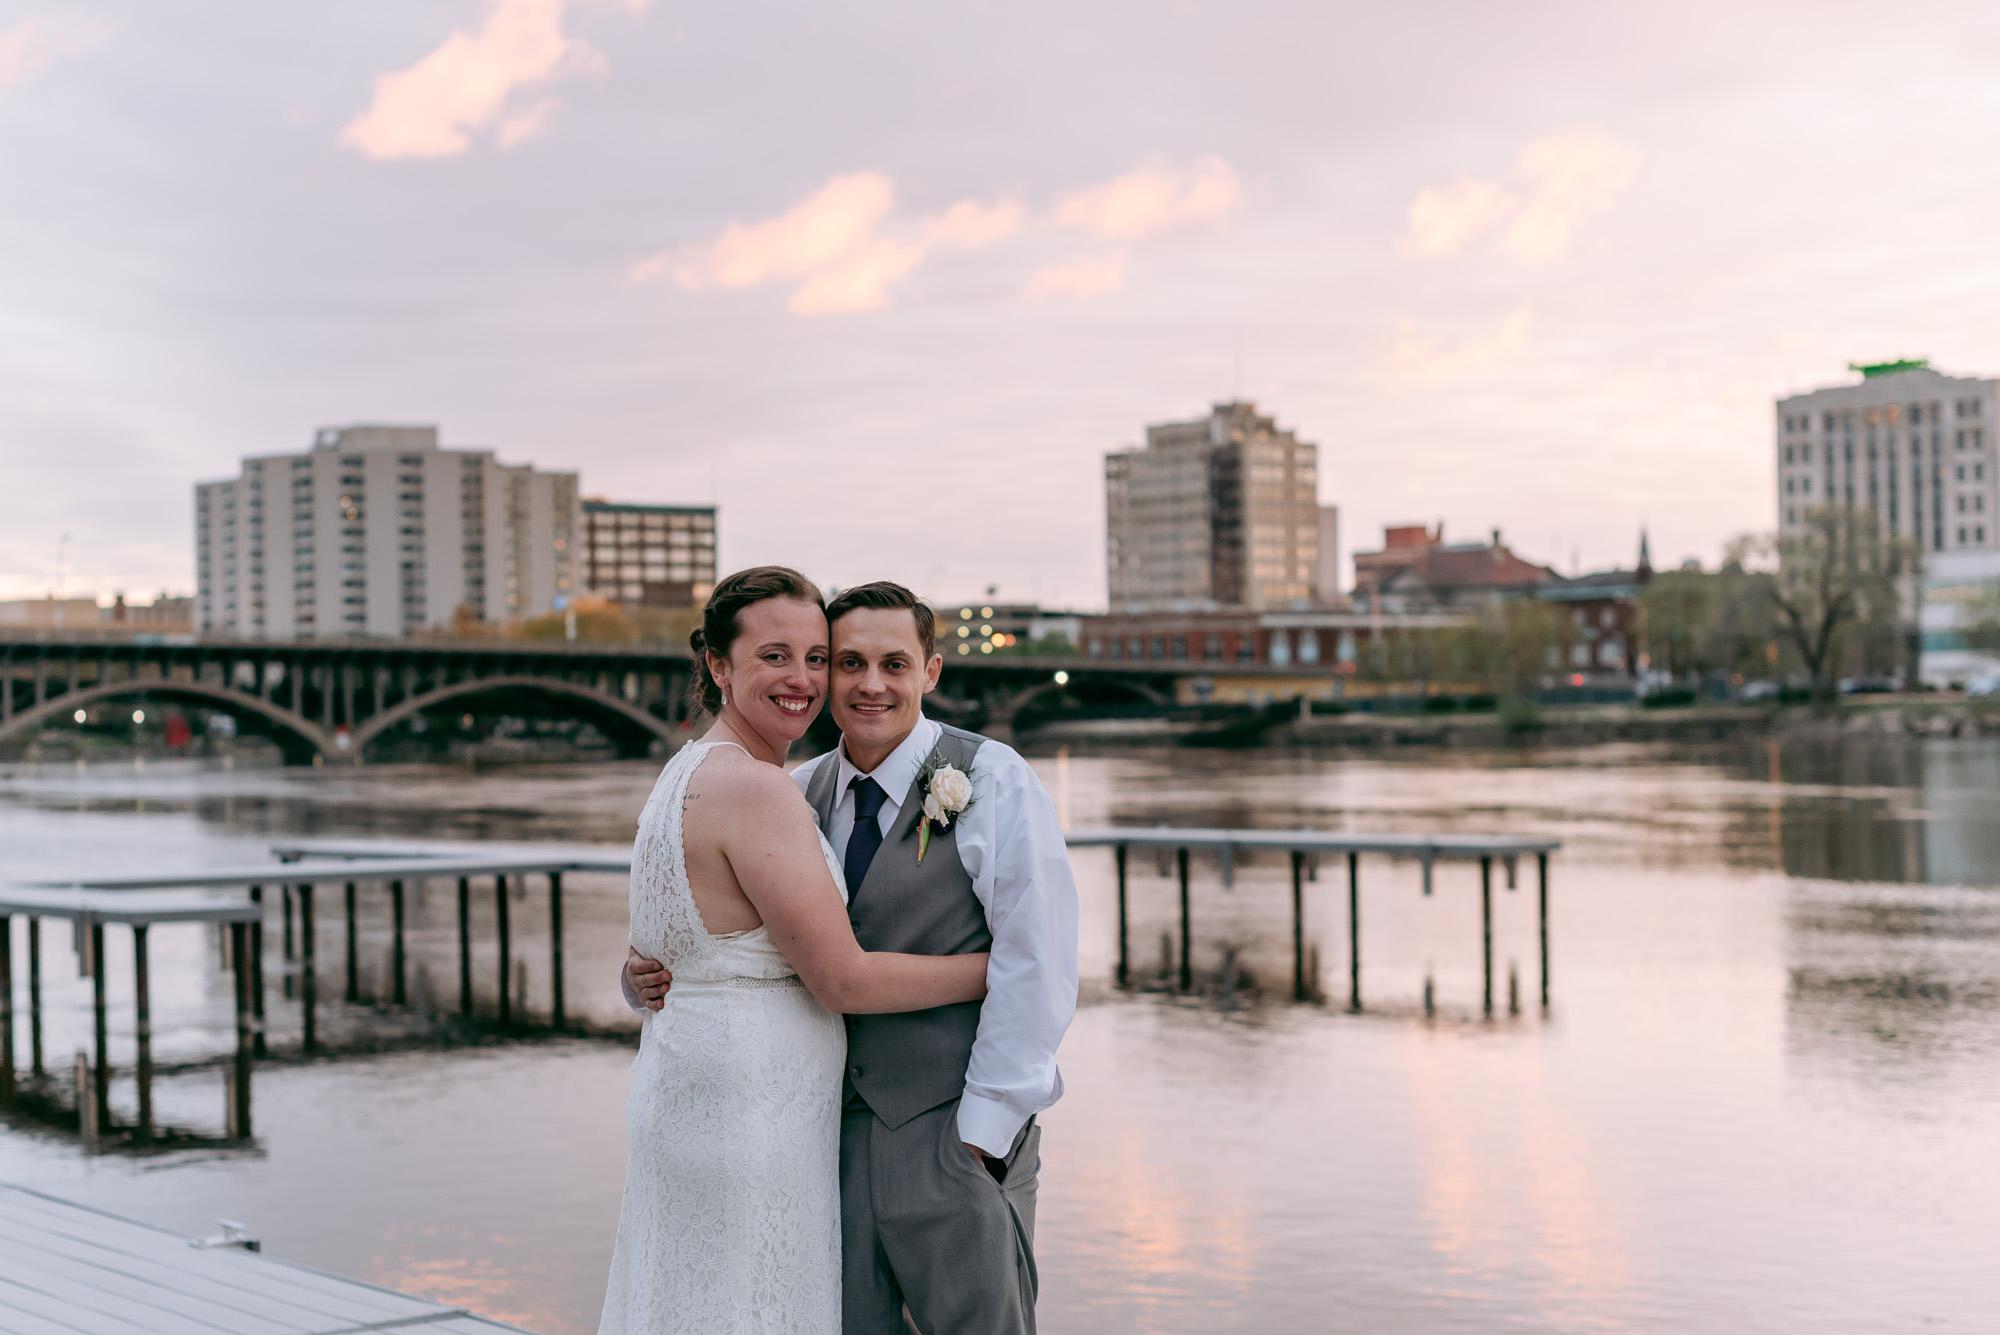 prairie-street-brewhouse-wedding-Rockford-IL-wedding-photographers-258.jpg